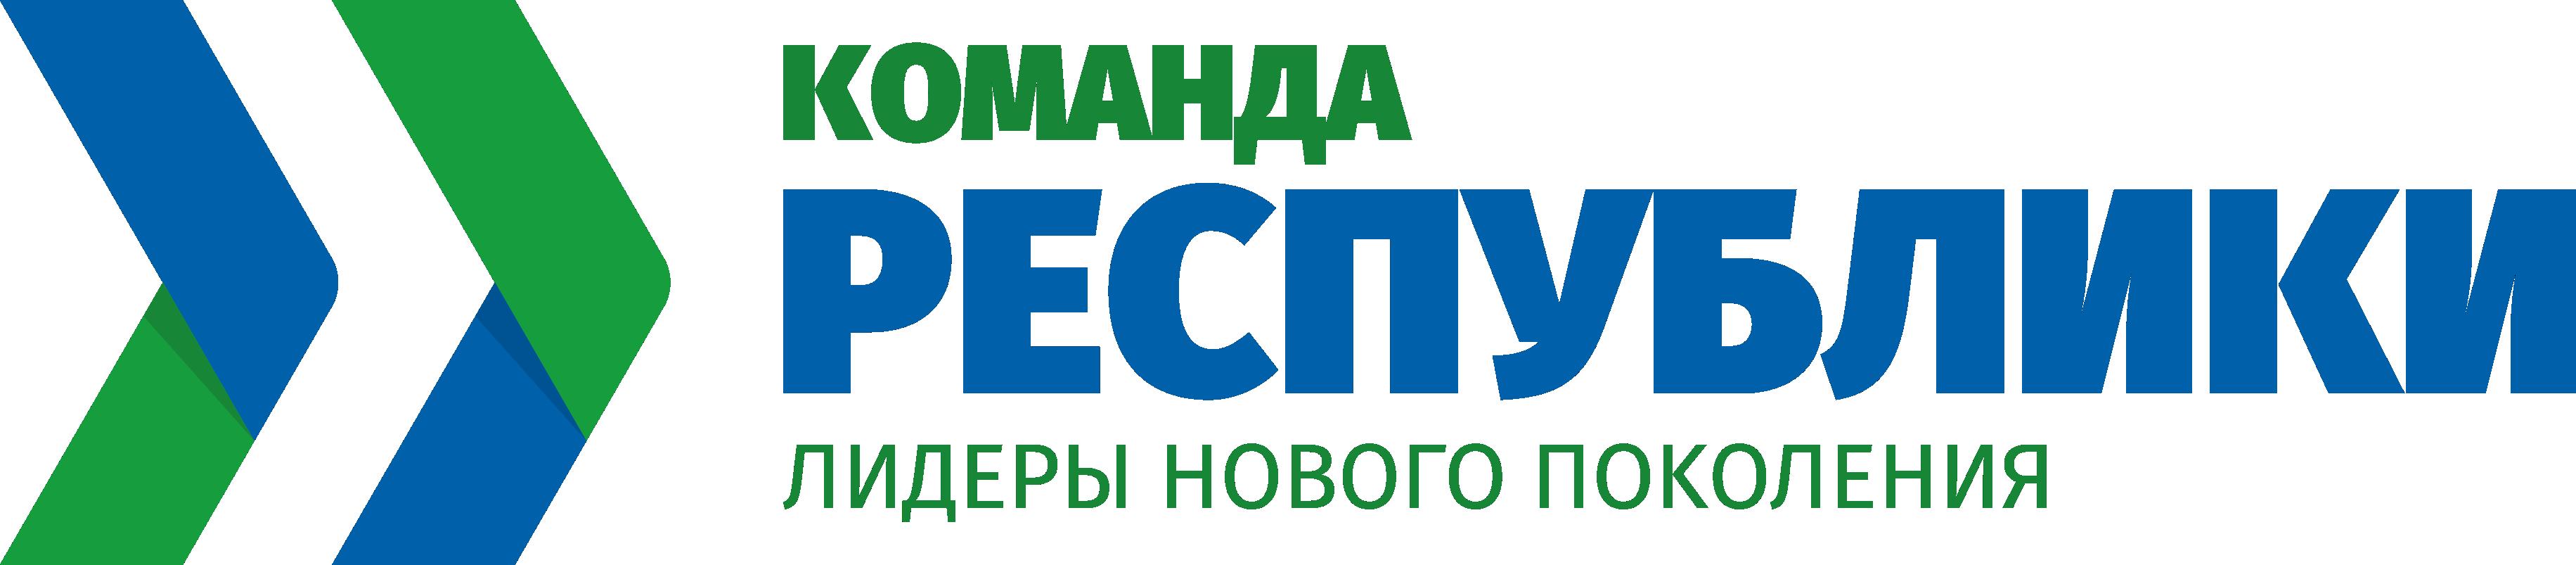 Команда Республики Коми